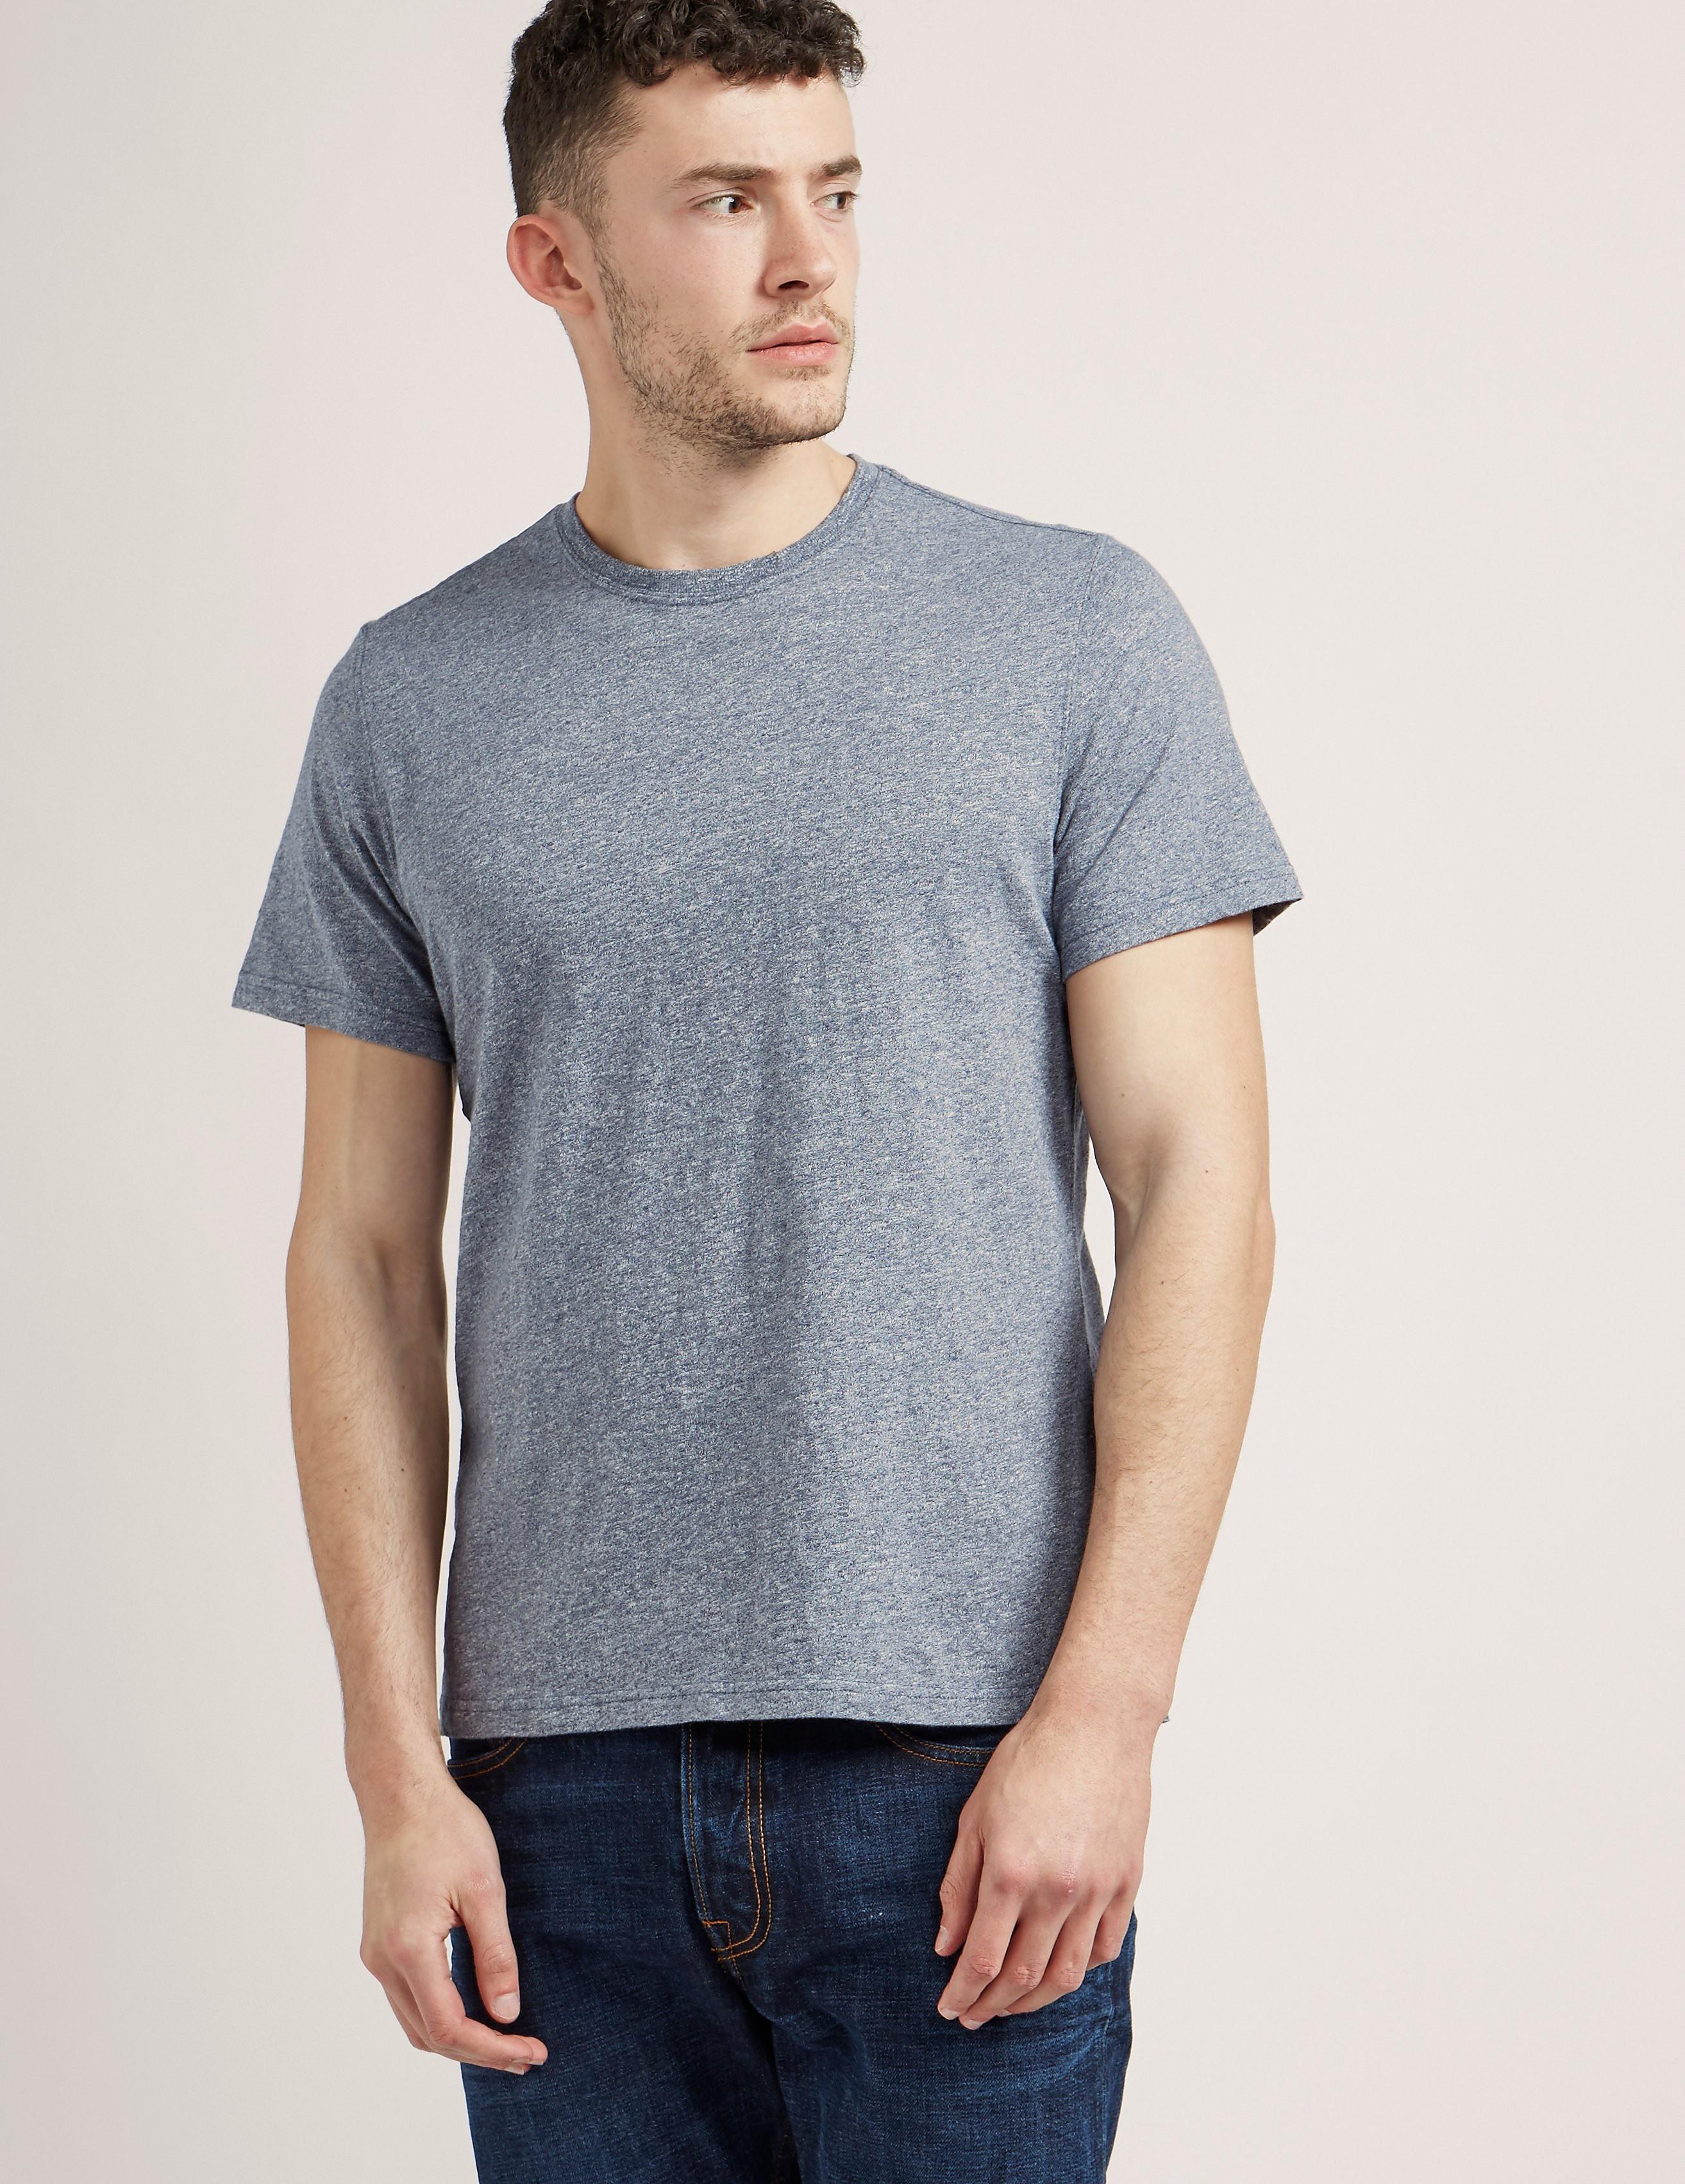 Barbour Capson Short Sleeve T-Shirt